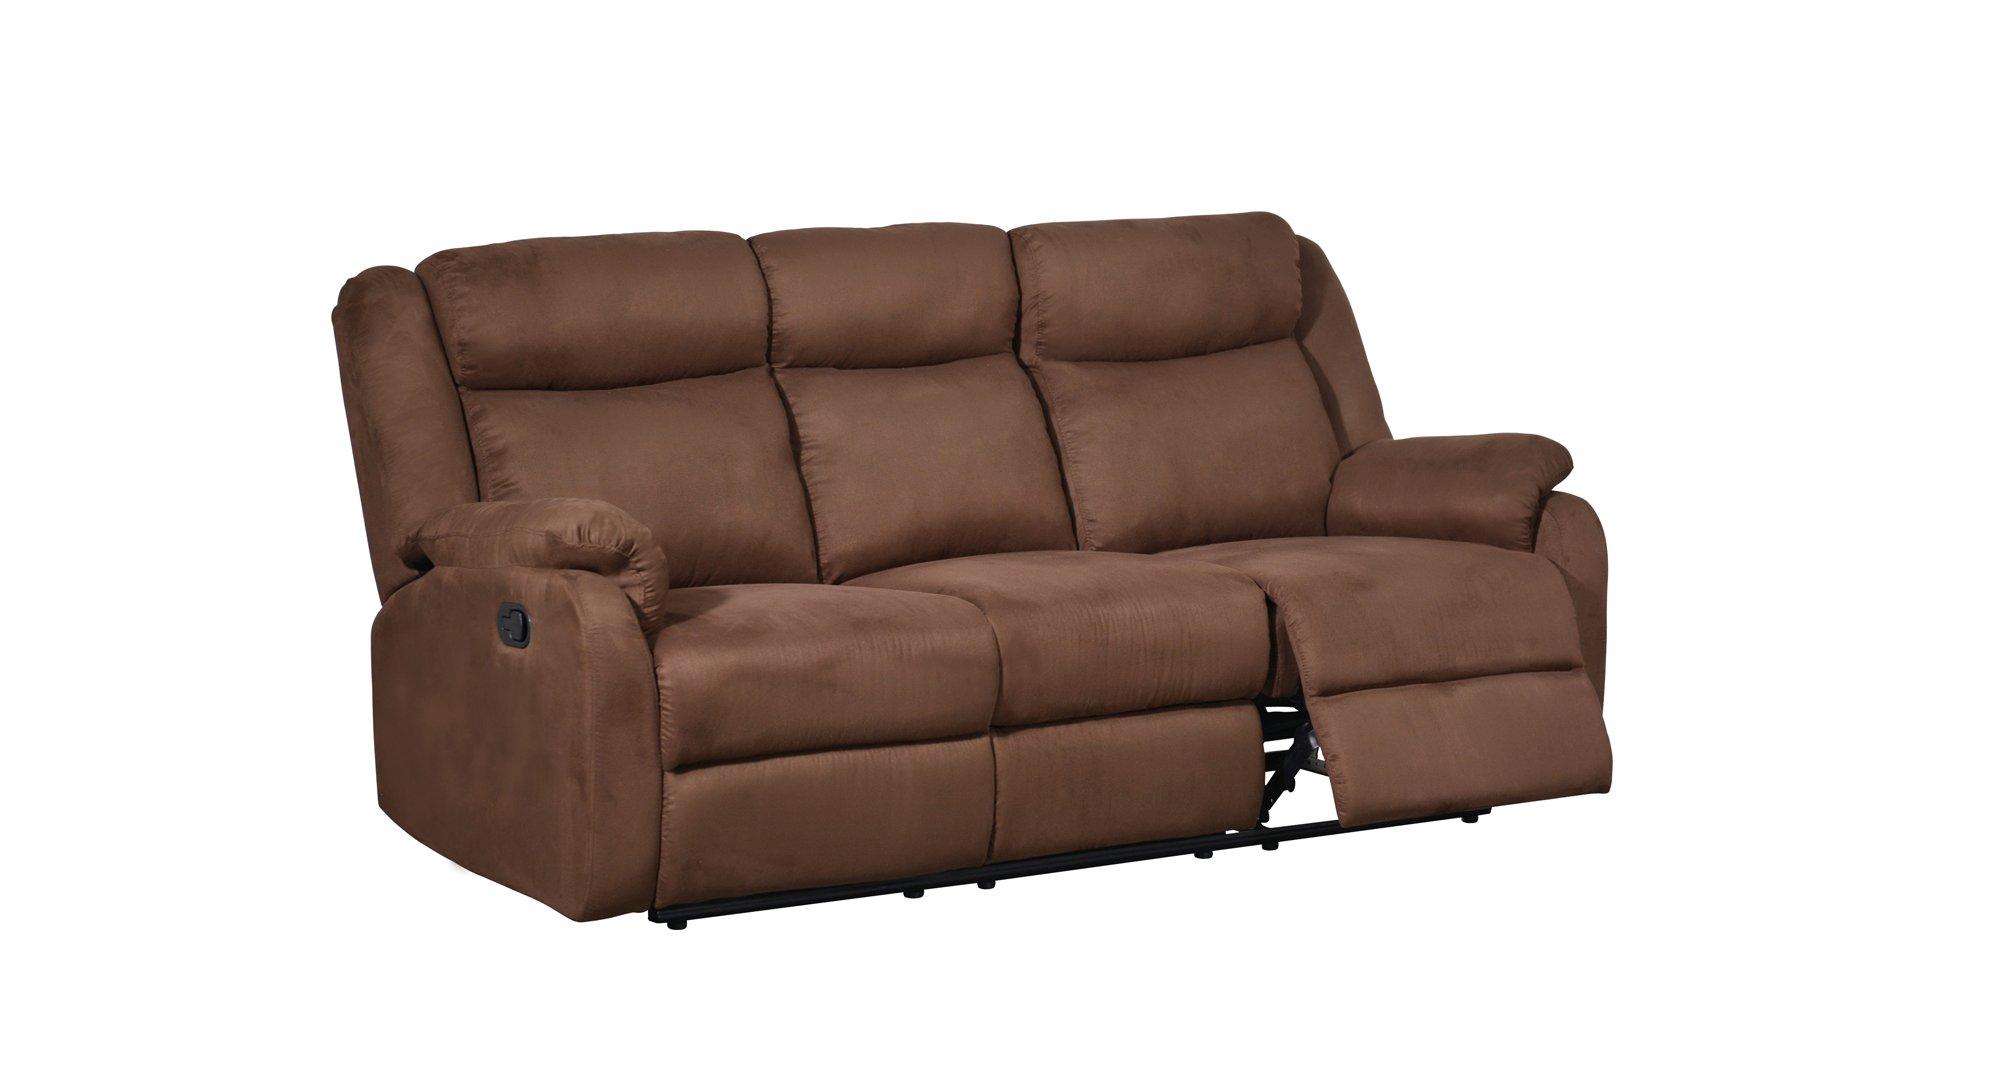 u8303 chocolate fabric reclining sofa by global furniture. Black Bedroom Furniture Sets. Home Design Ideas